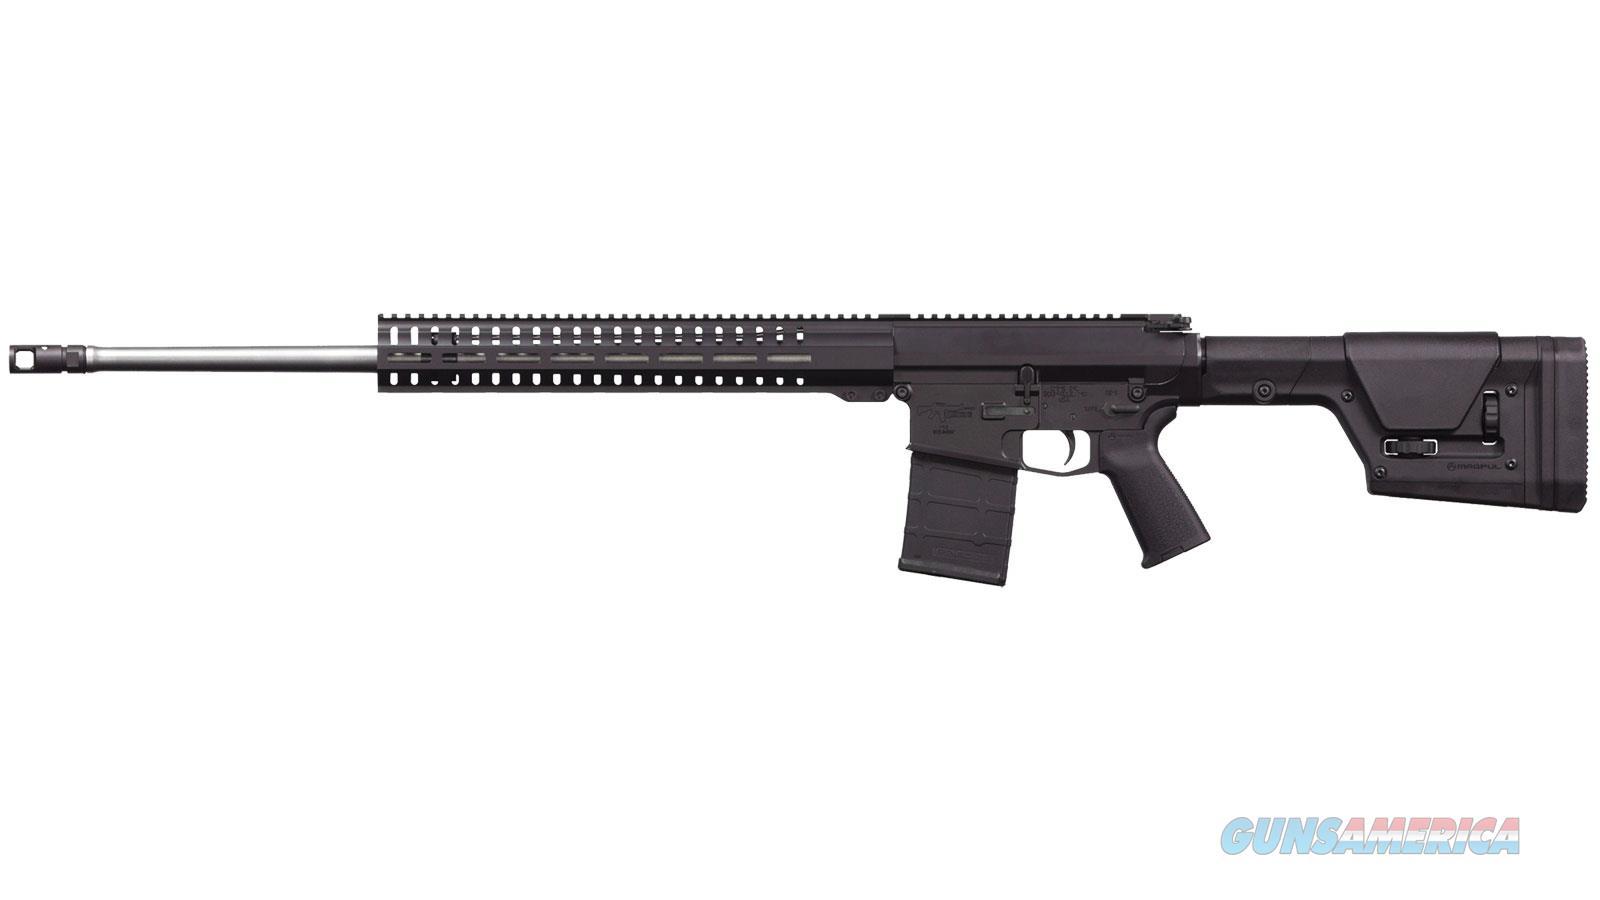 Cmmg Mk3 Dtr2 65A9F70  Guns > Rifles > C Misc Rifles